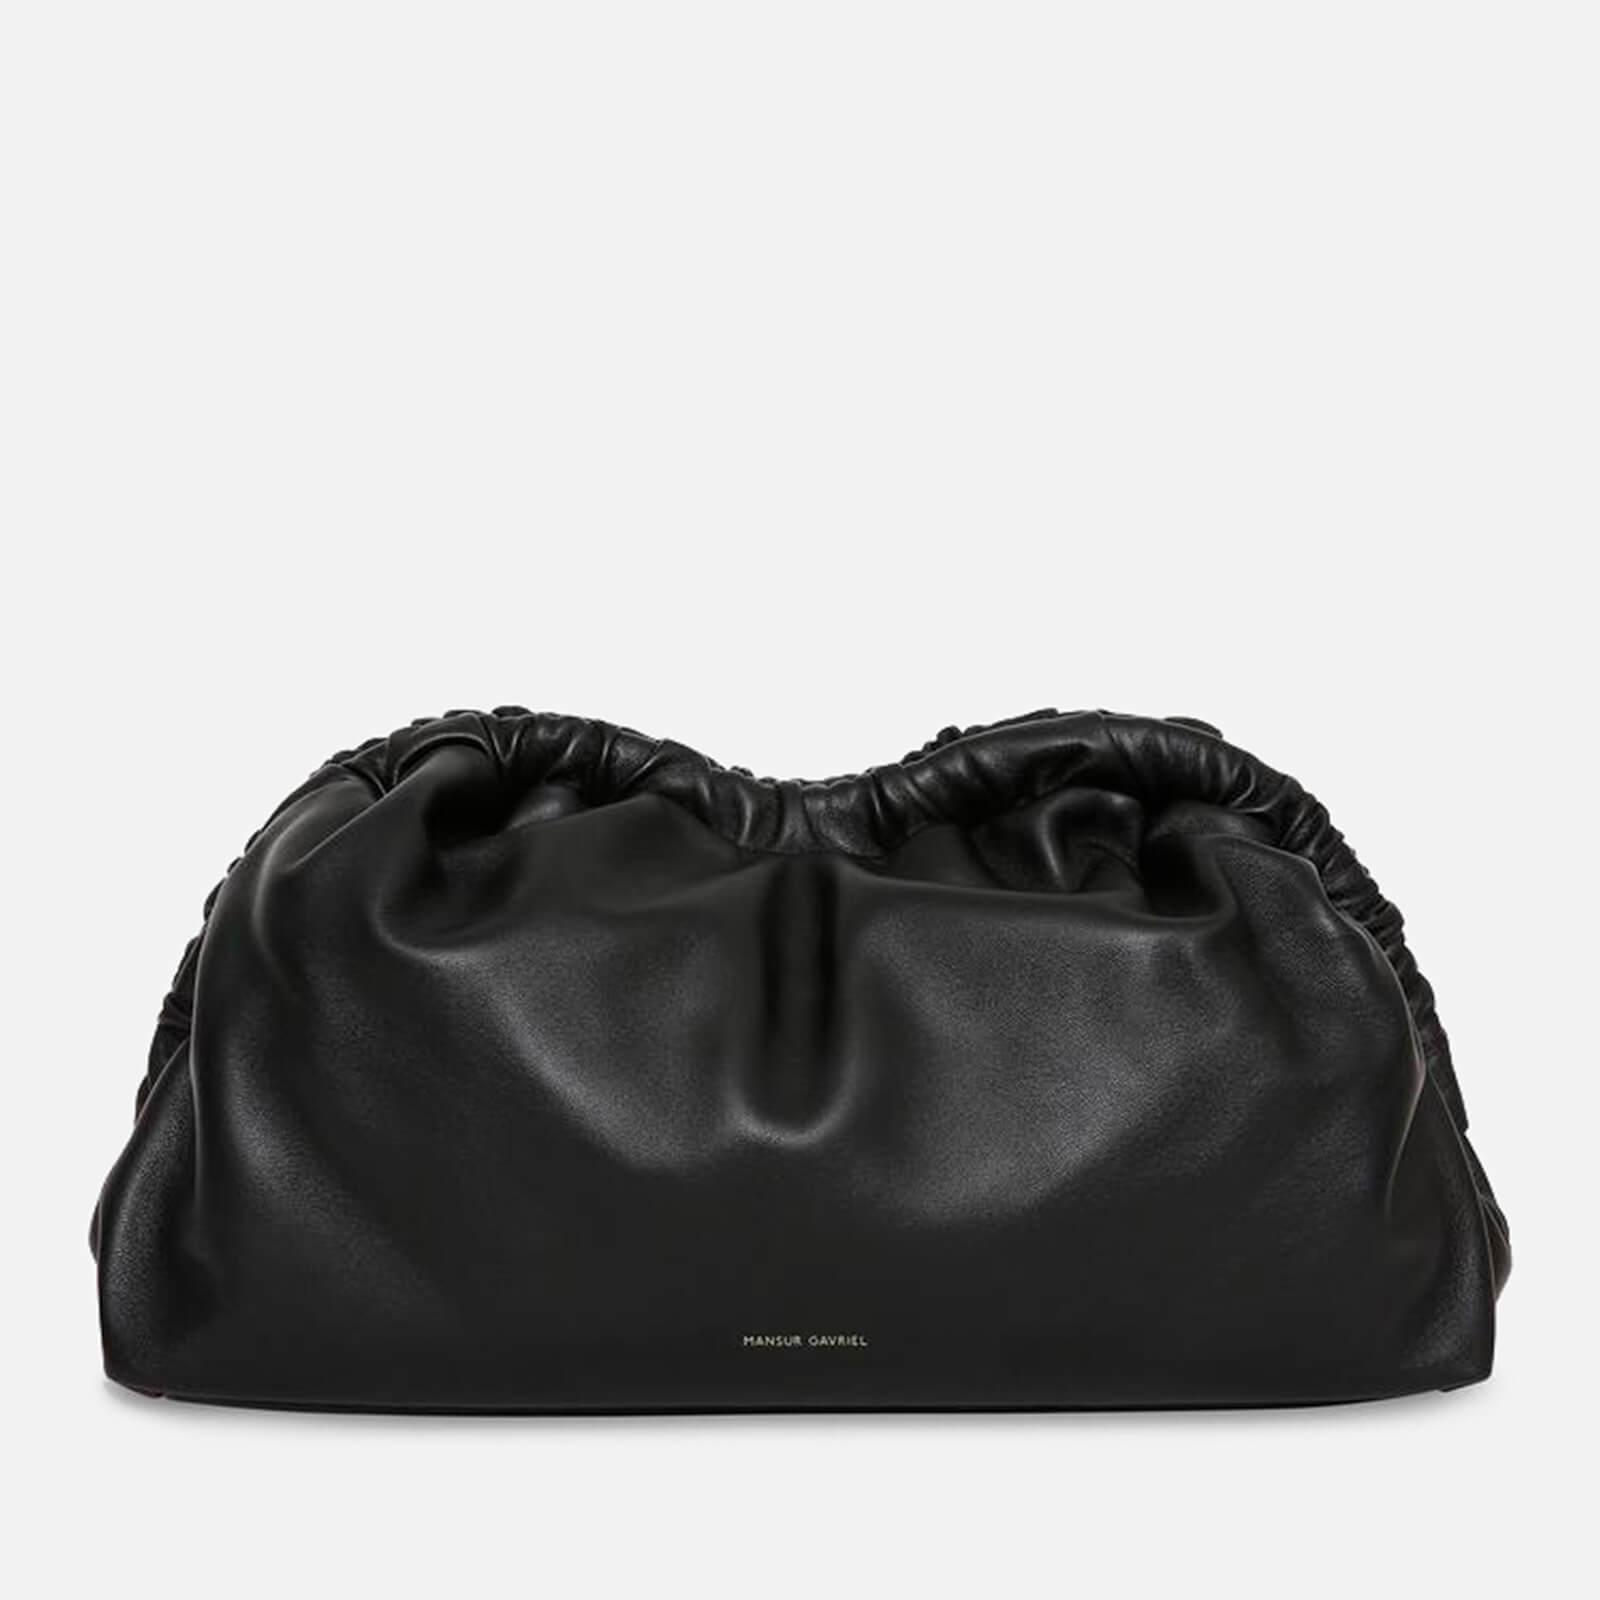 Mansur Gavriel Women's Cloud Clutch Bag - Black/Flamma